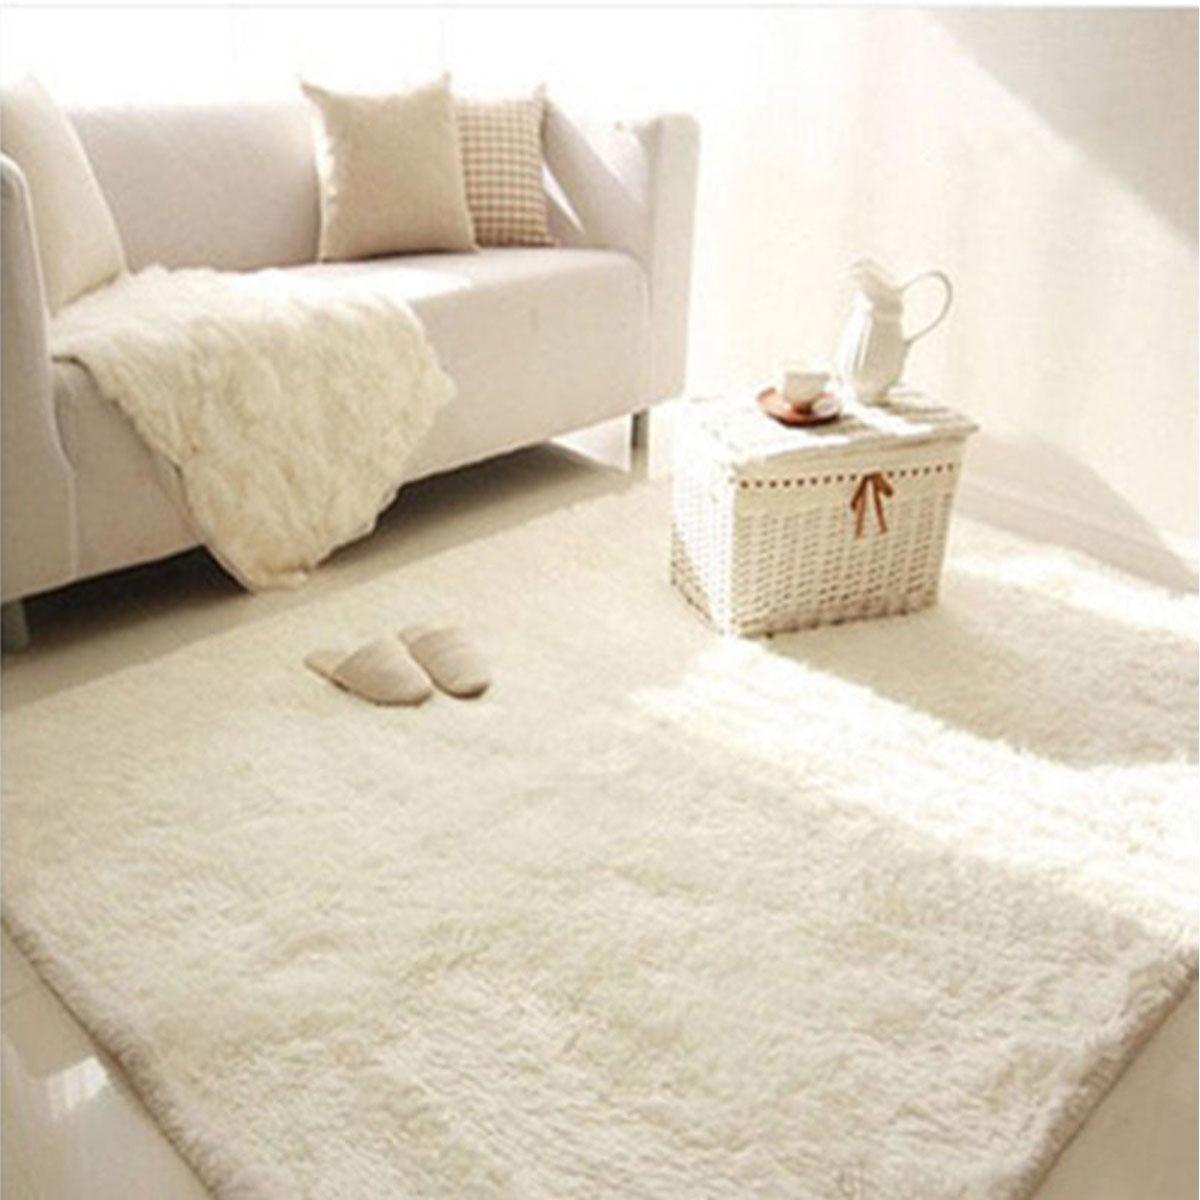 63 X90 5 Modern Rectangle Soft Fluffy Floor Rug Anti Skid Shag Shaggy Area Rug Bedroom Dining Room Carpet Yoga Mat Child Play Mat